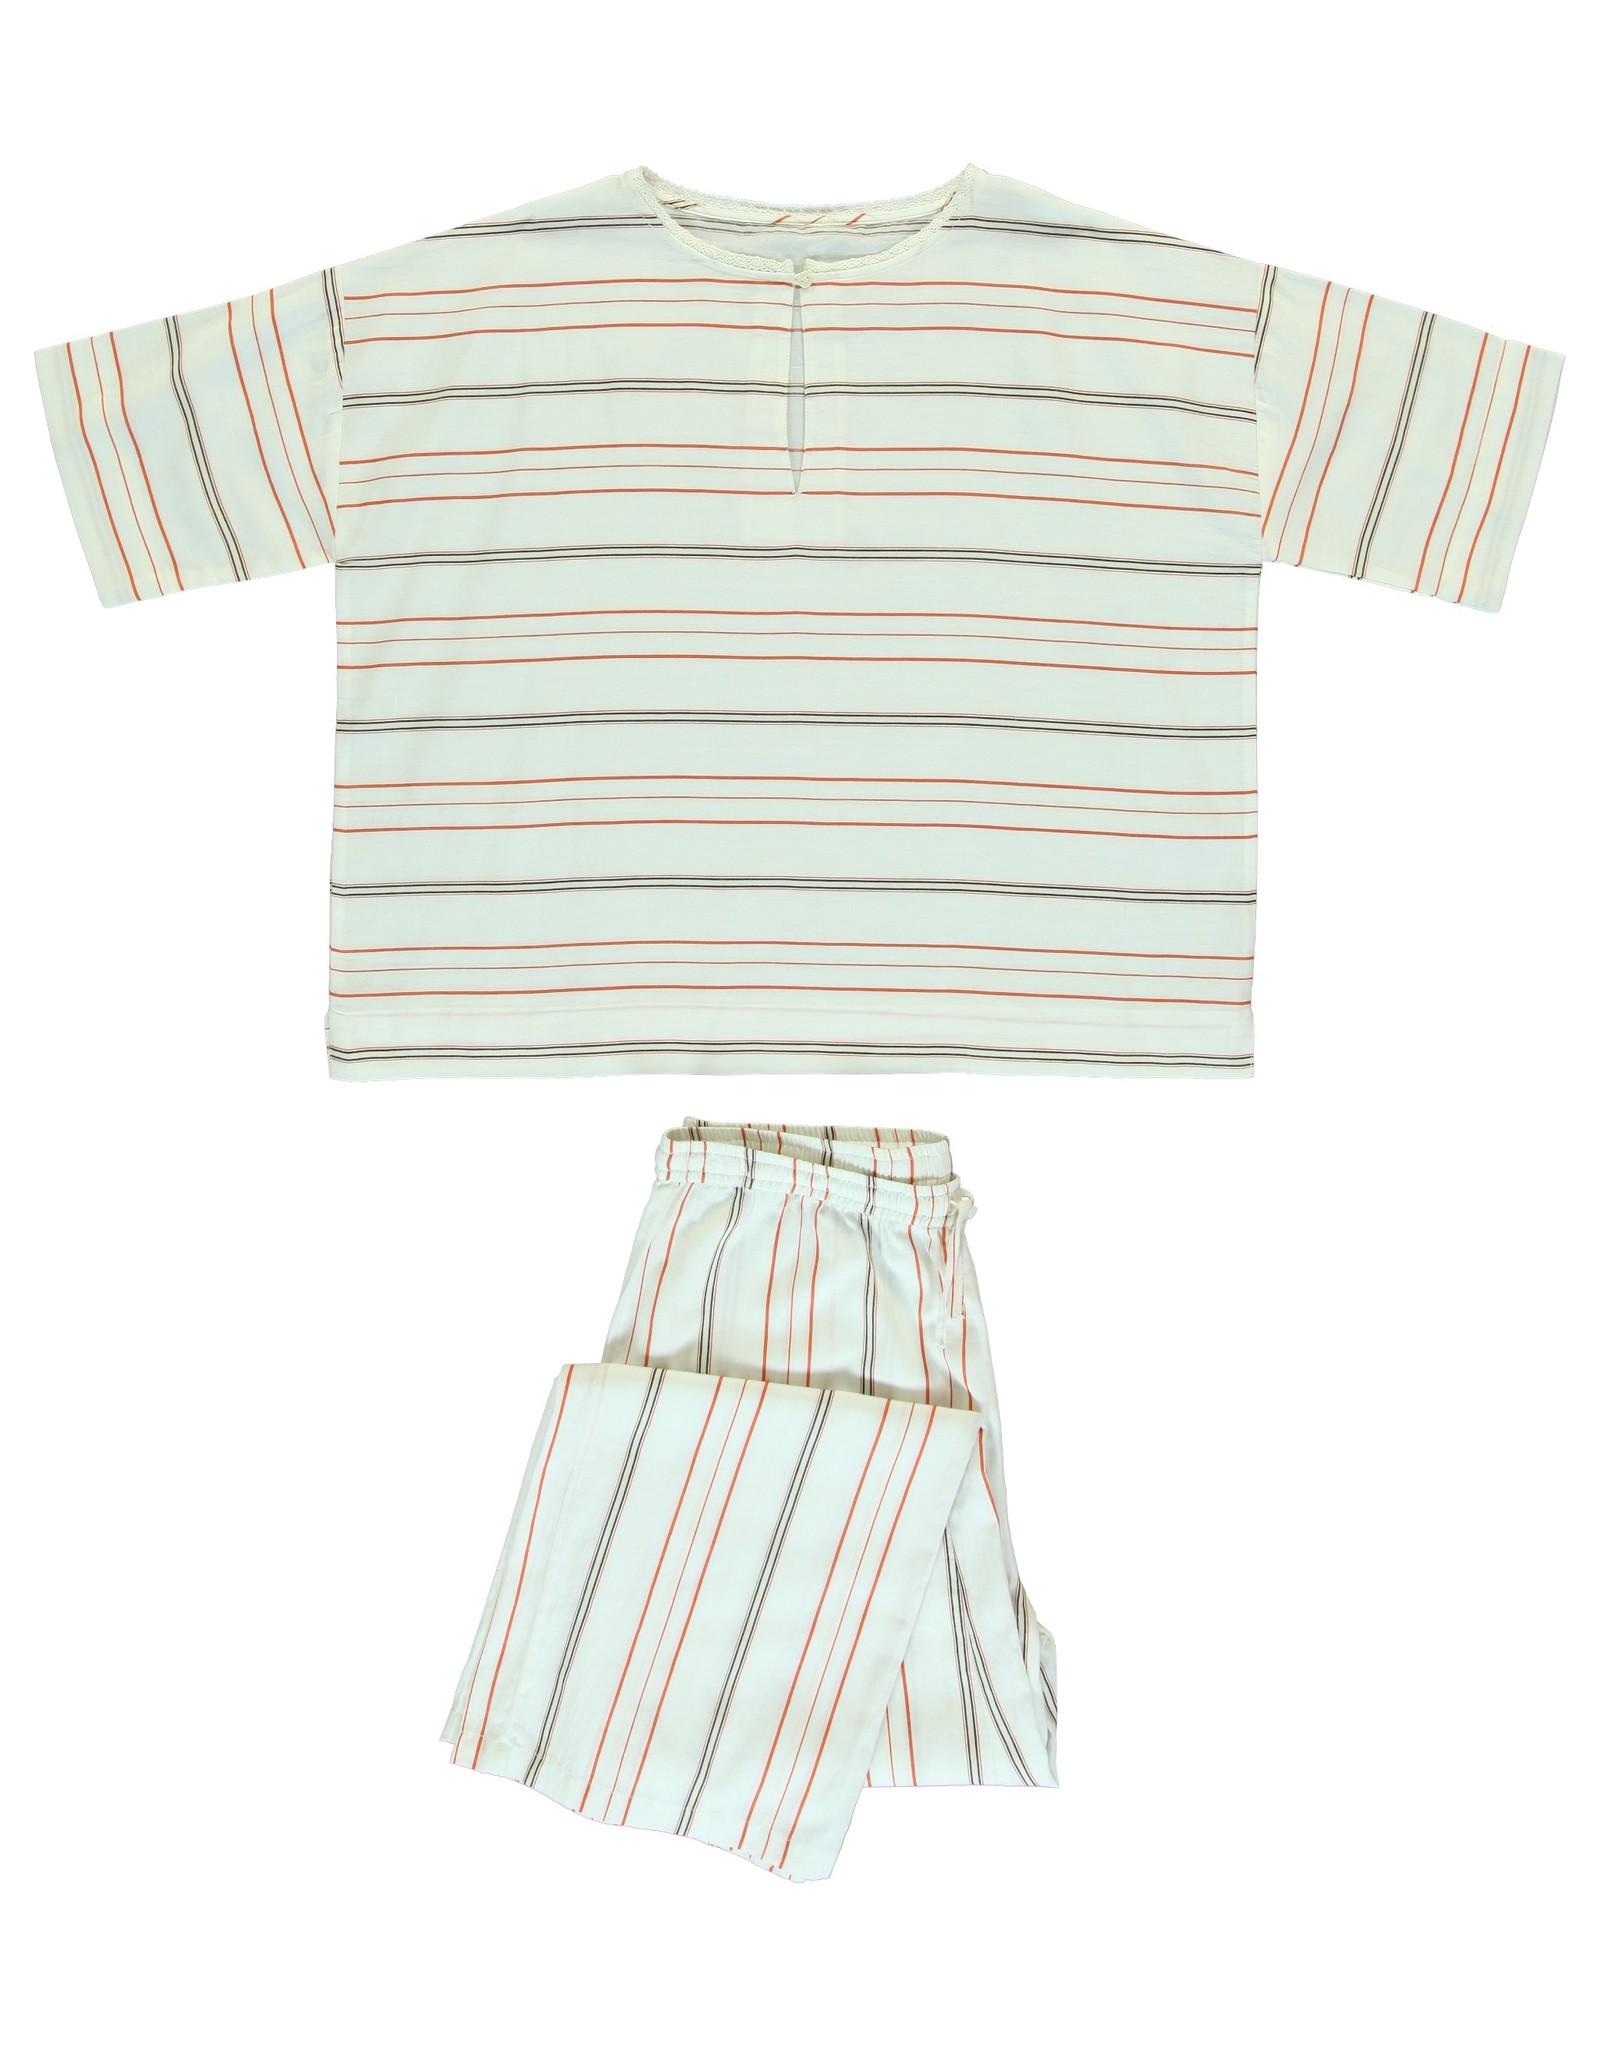 Dorélit Calypso & Alkes | Pajama Set Woven | Chili